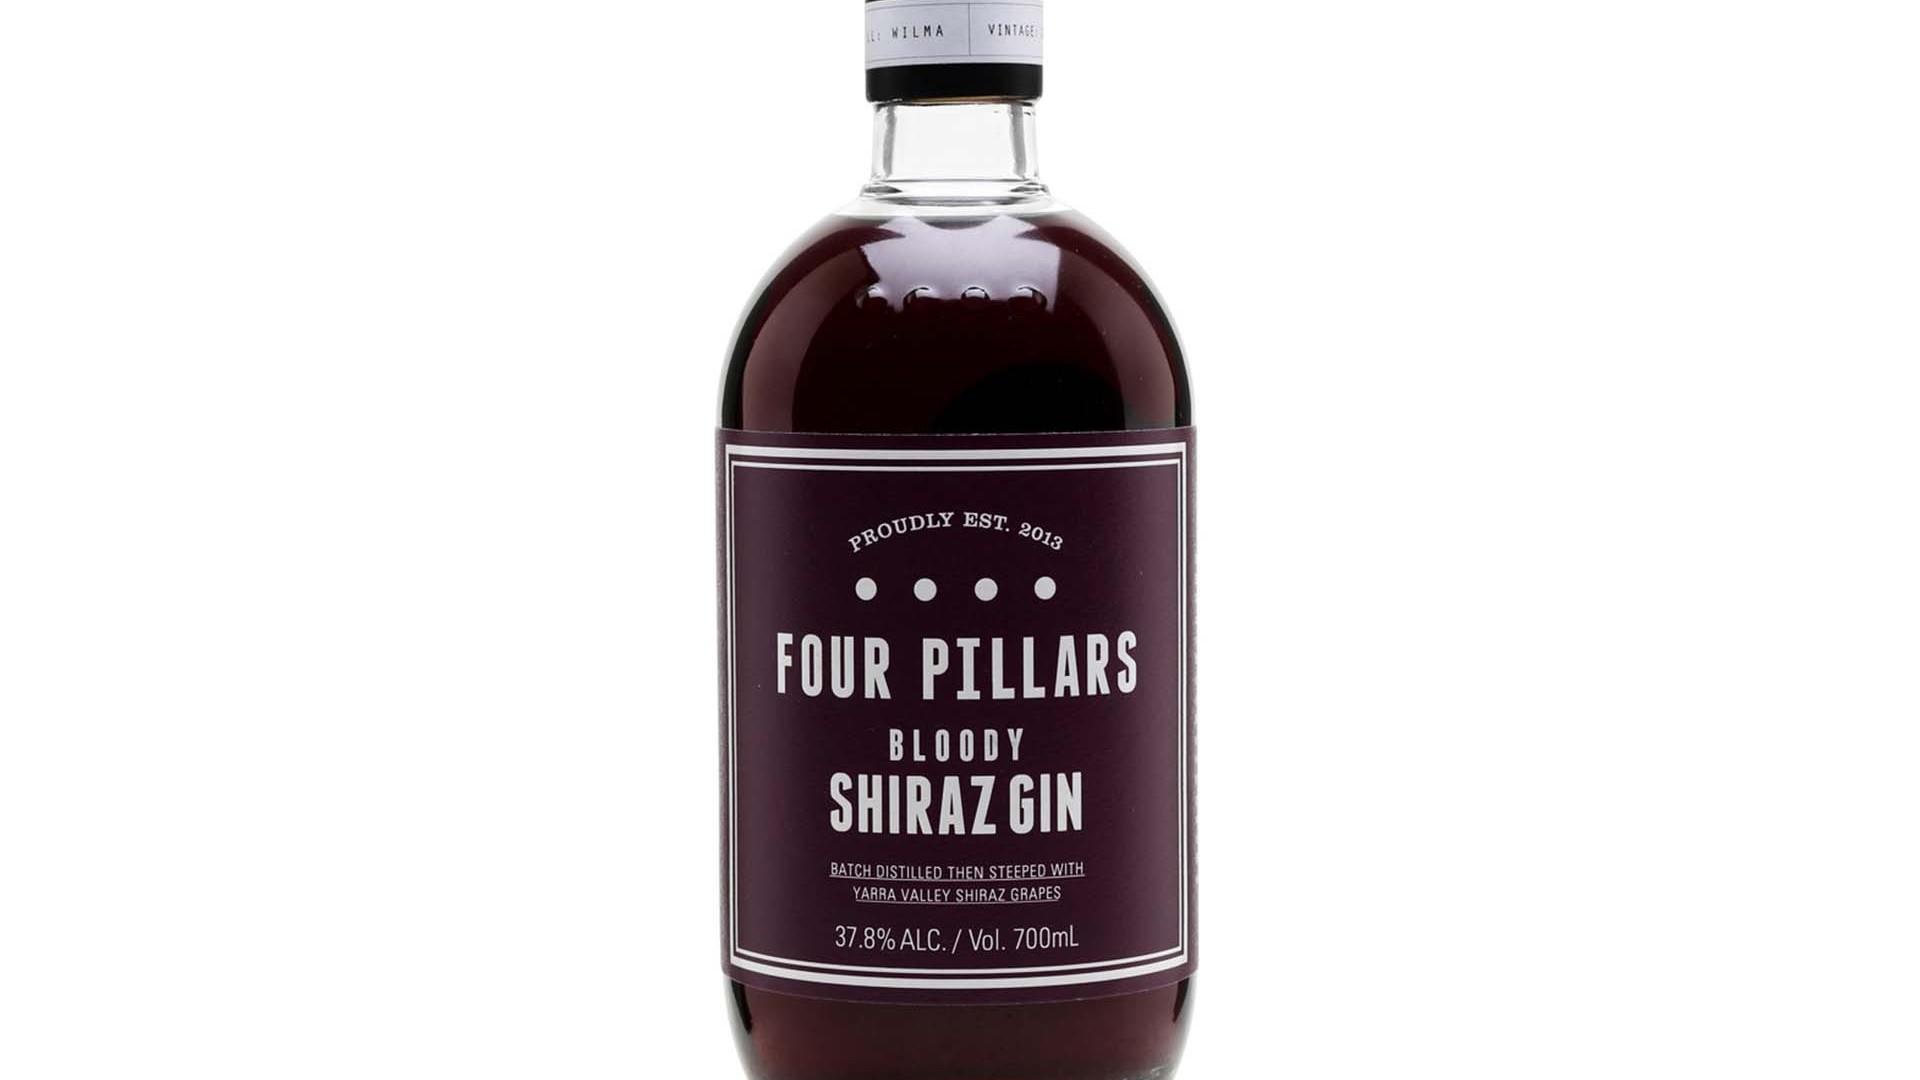 Four Pillars Bloody Shiraz